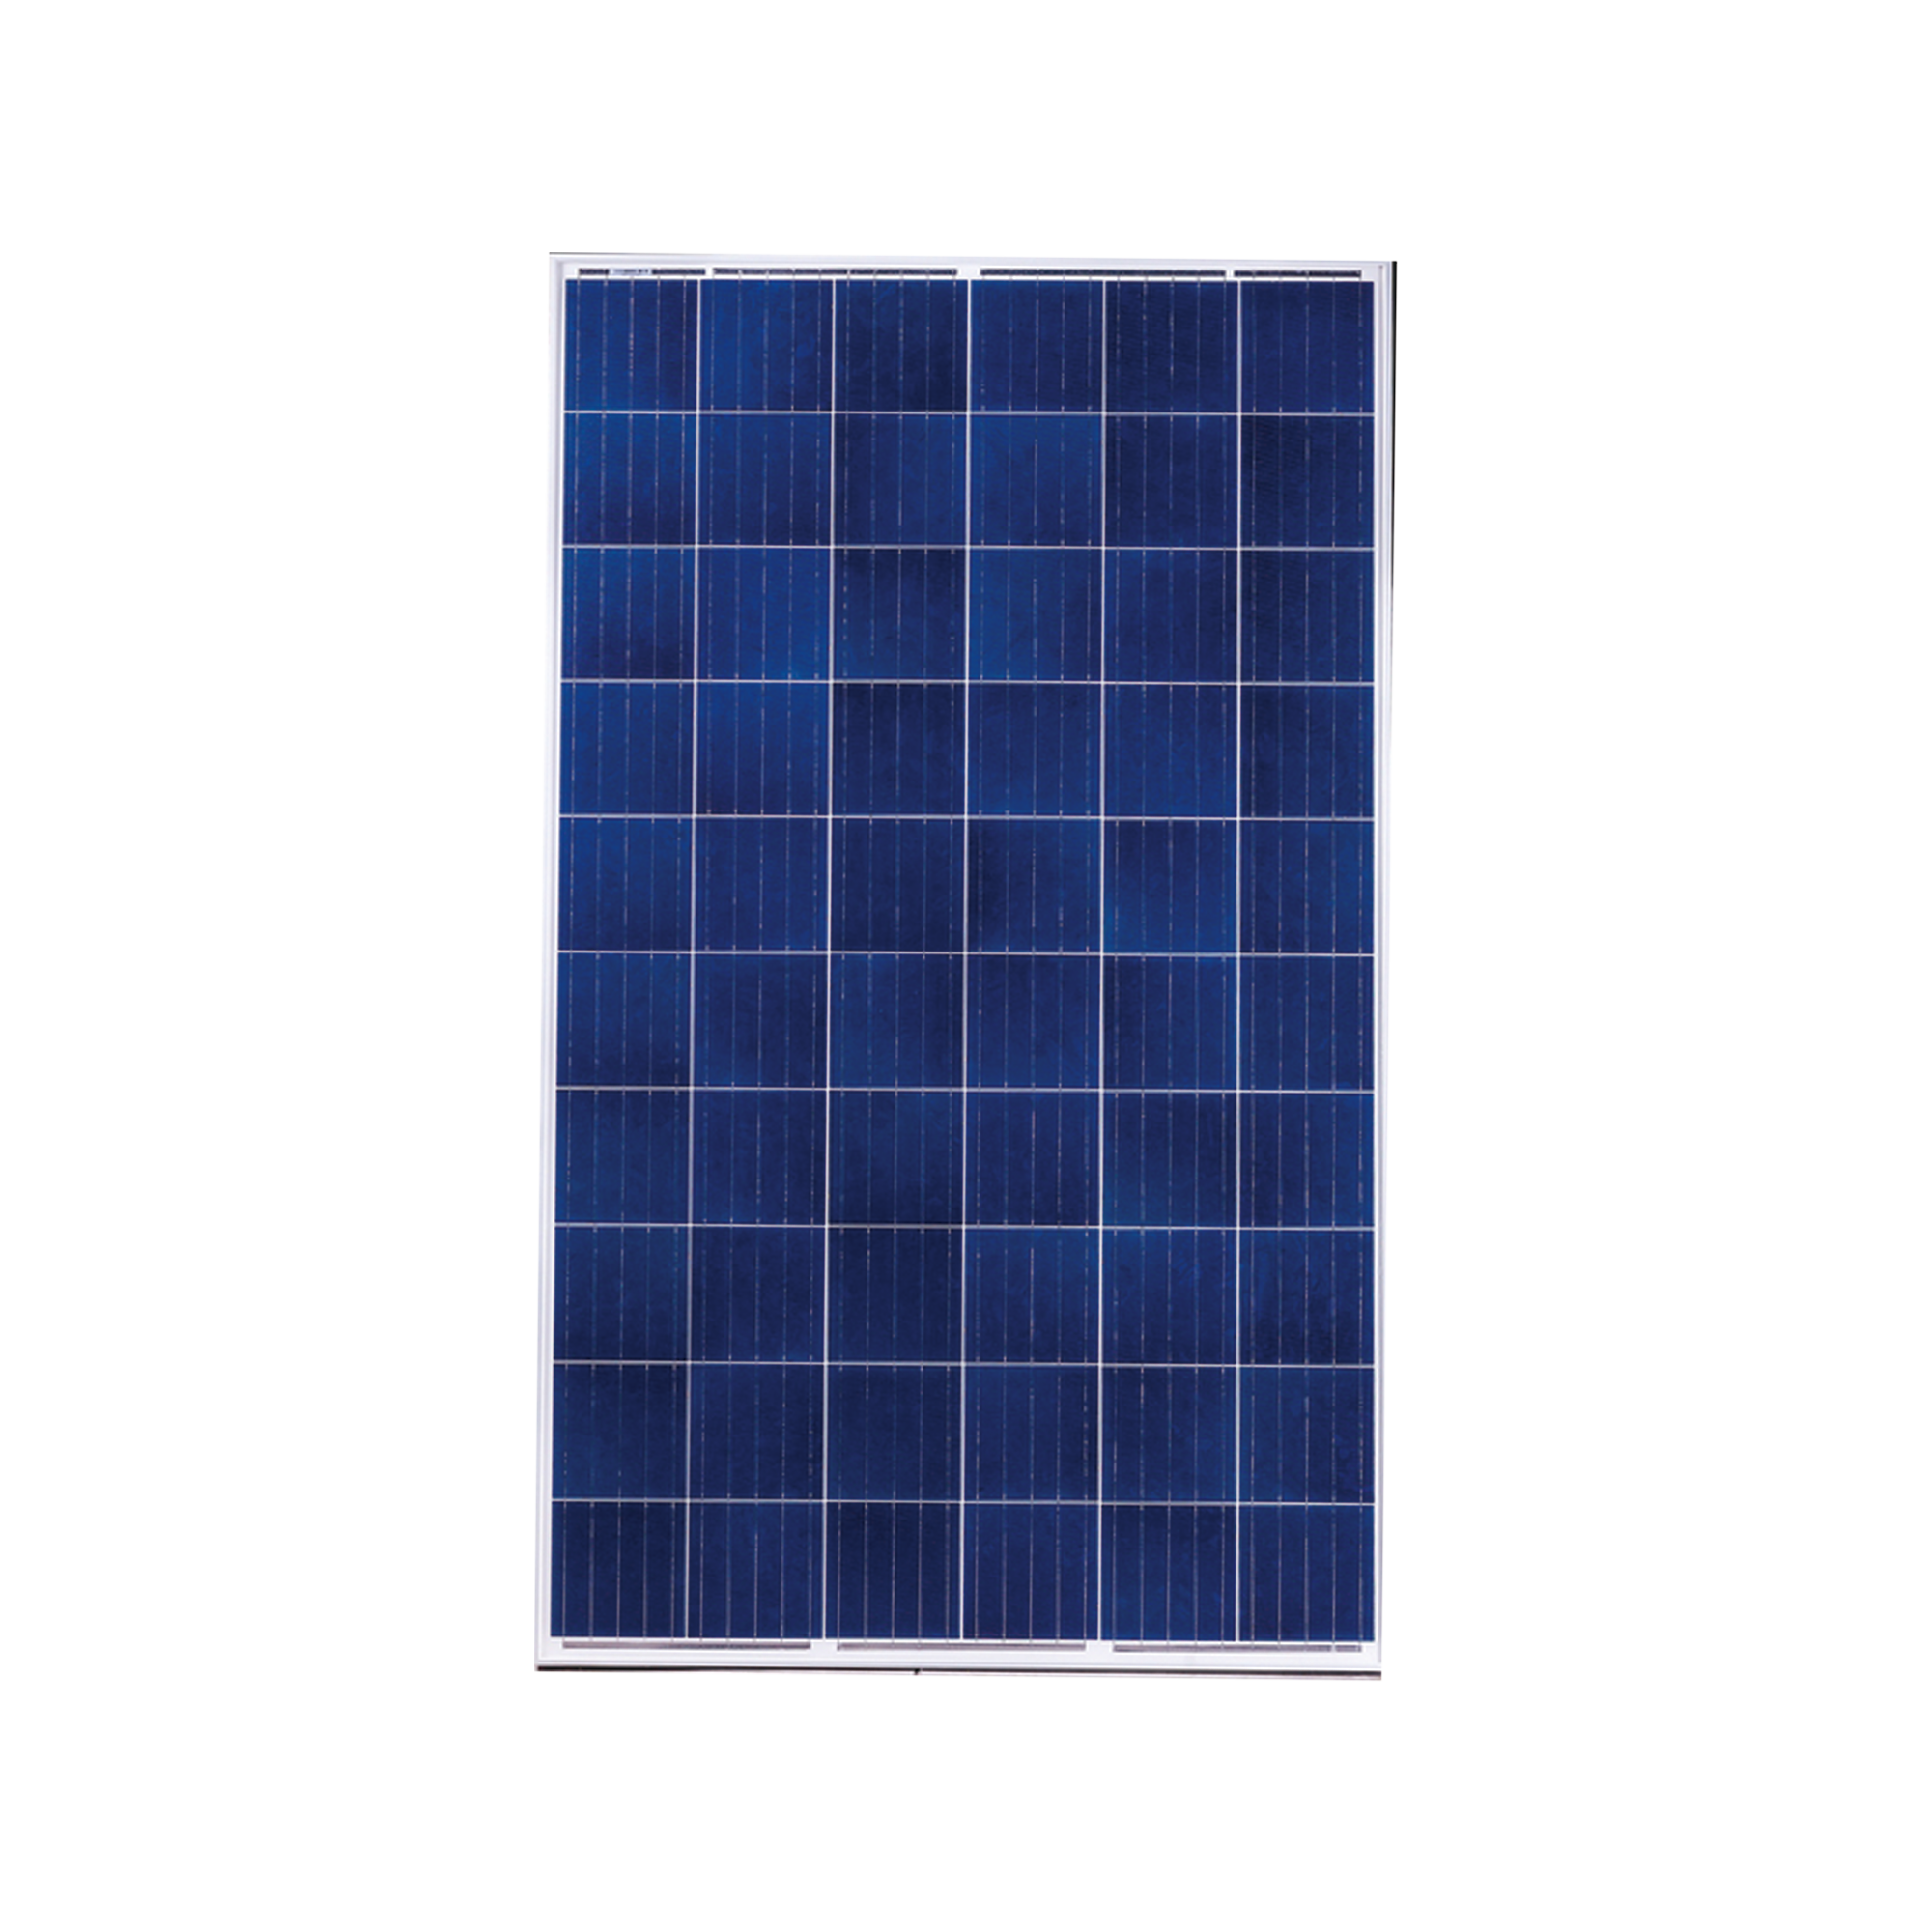 Modulo Fotovoltaico policristalino  330 W 24 VCD, 72 Celdas Especial Para Sistemas de Energia Distribuida